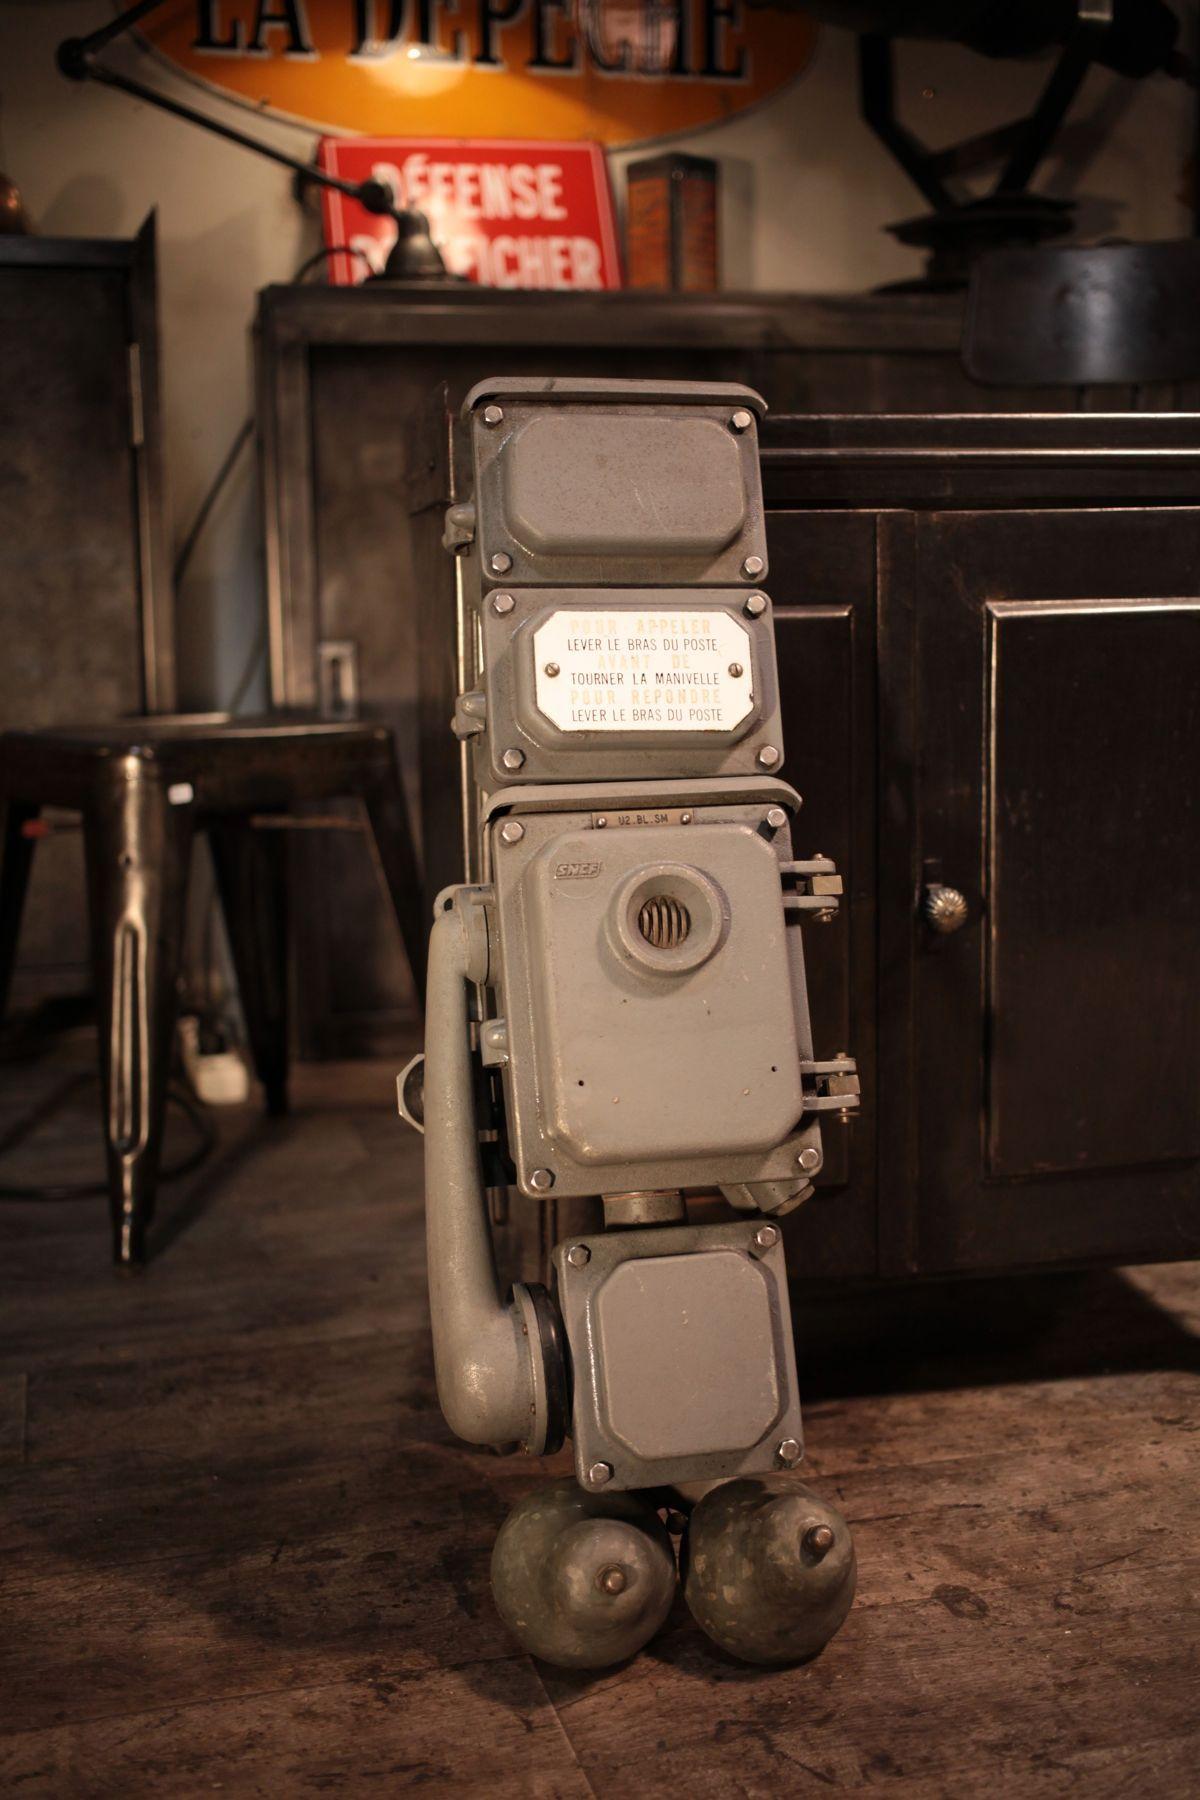 telephone ancien sncf meuble industriel vintage de renaud jaylac en 2019 d coration. Black Bedroom Furniture Sets. Home Design Ideas